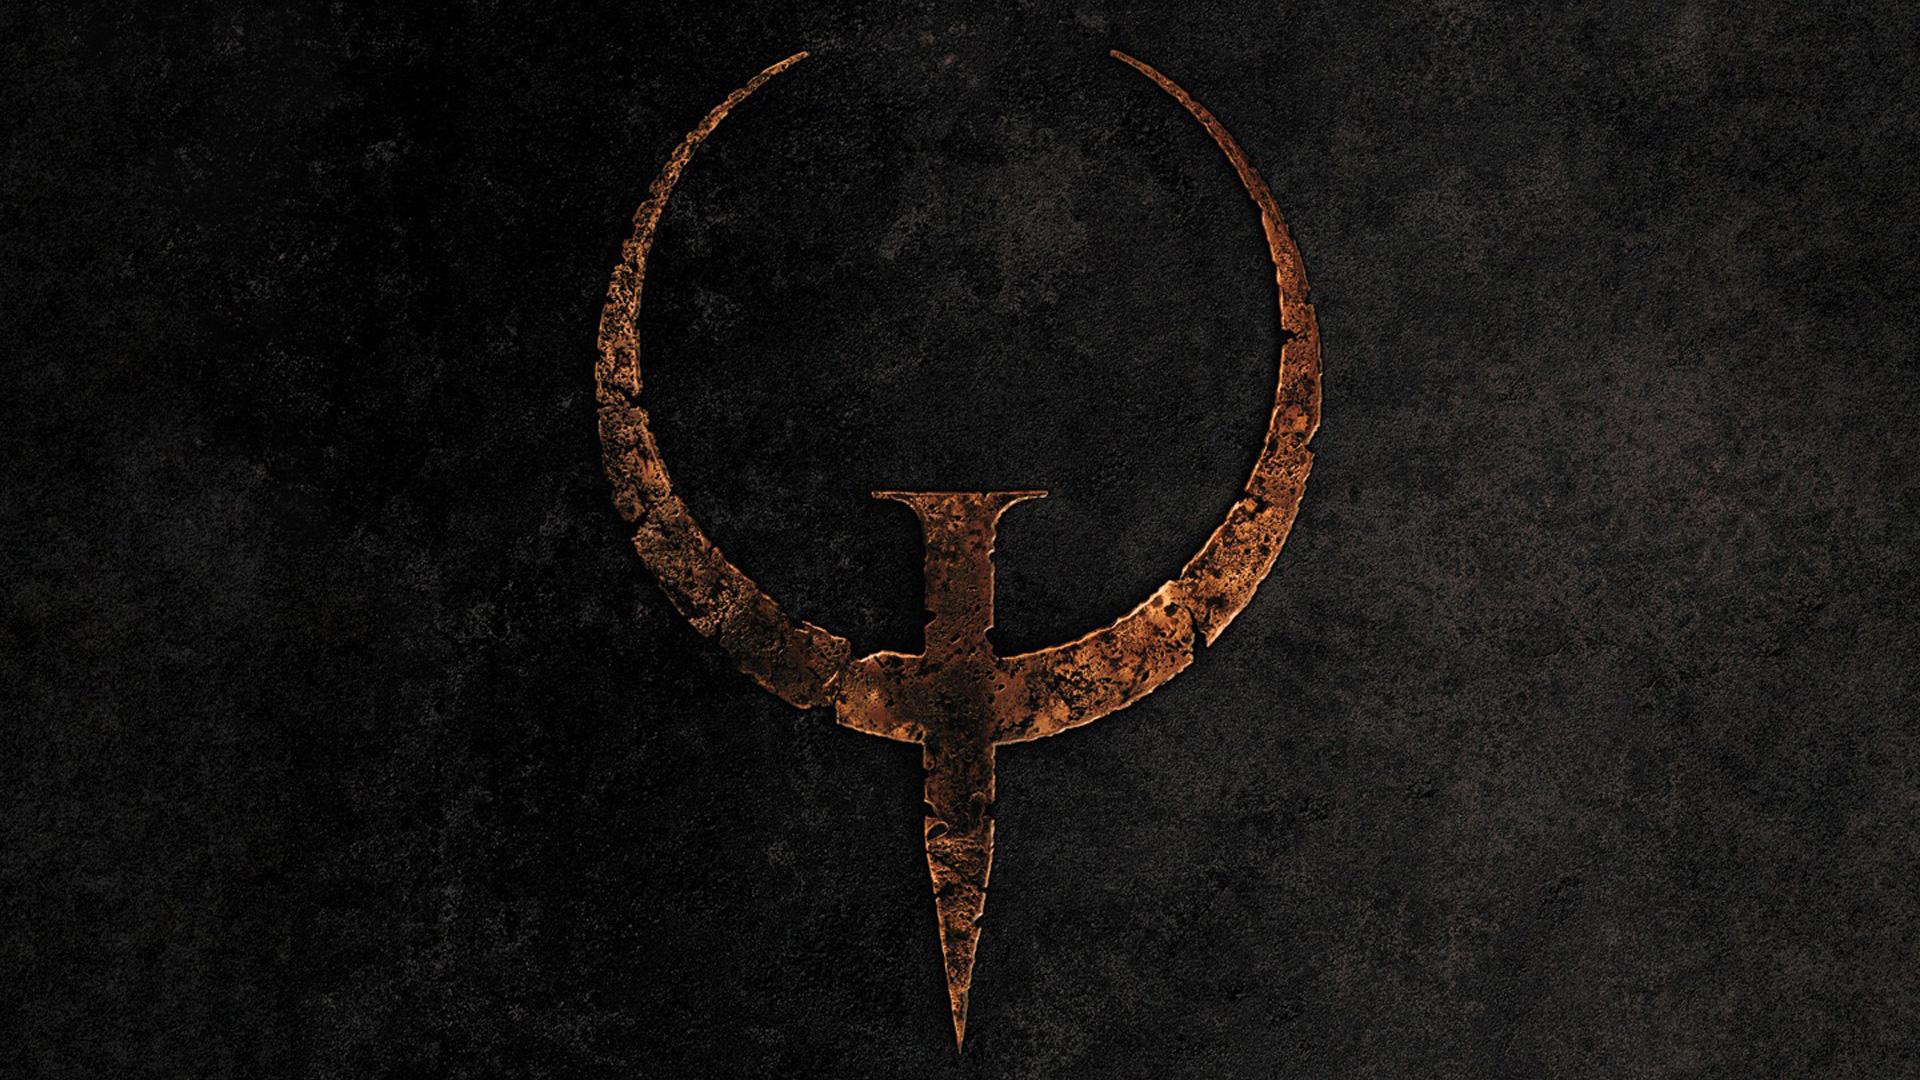 Free Quake Wallpaper in 1920x1080